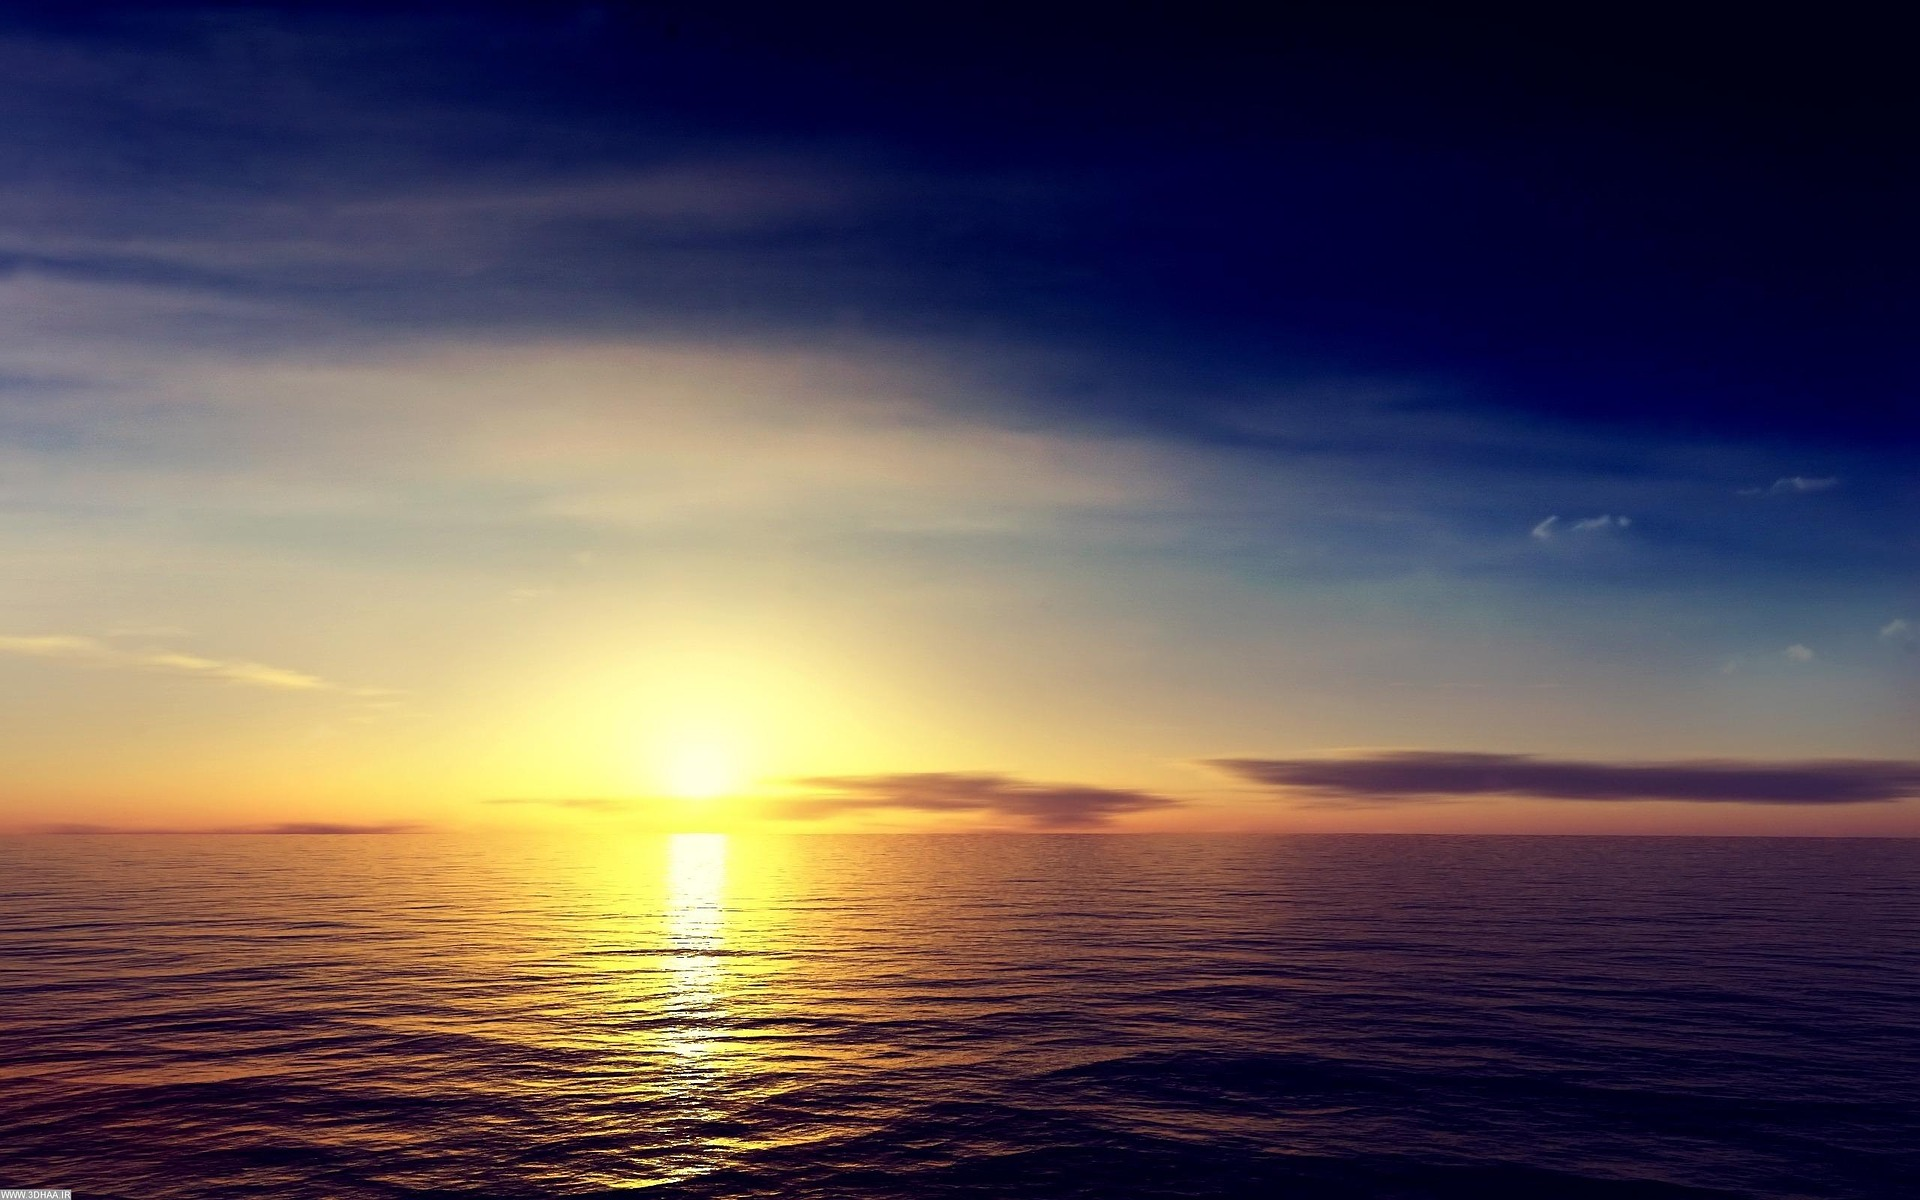 sunset-2419503_1920.jpg